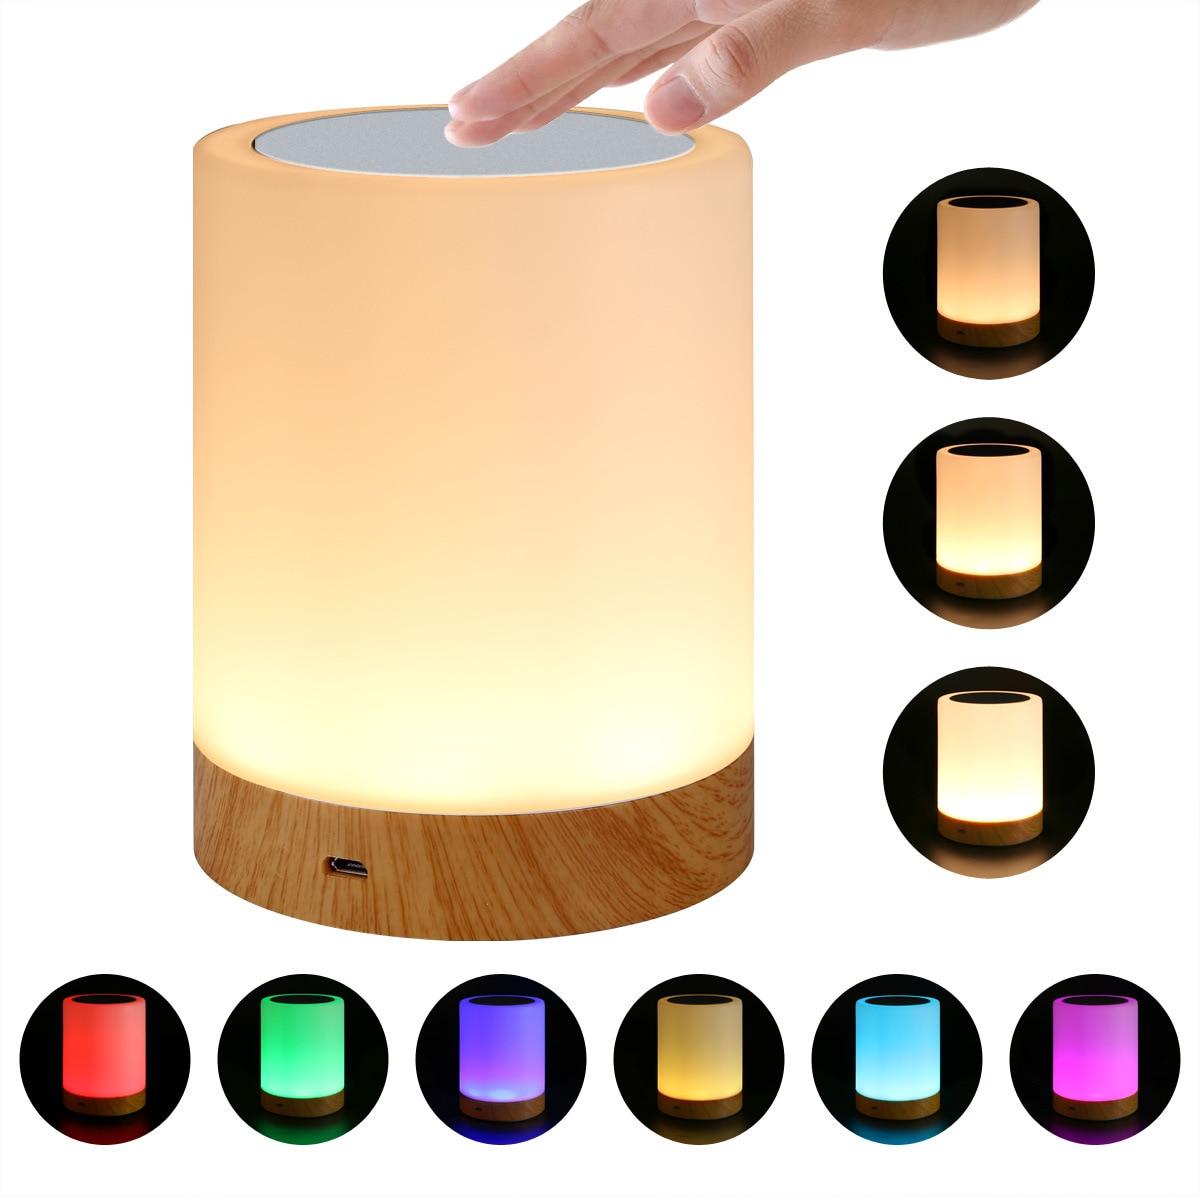 Nuevo LED regulable colorido creativo grano de madera recargable noche lámpara de mesa de noche lámpara de dormitorio toque clap luz regalo Foco Led de trabajo cob 8000LM lámpara recargable uso 2*18650 batería led luz magnética portátil gancho clip impermeable